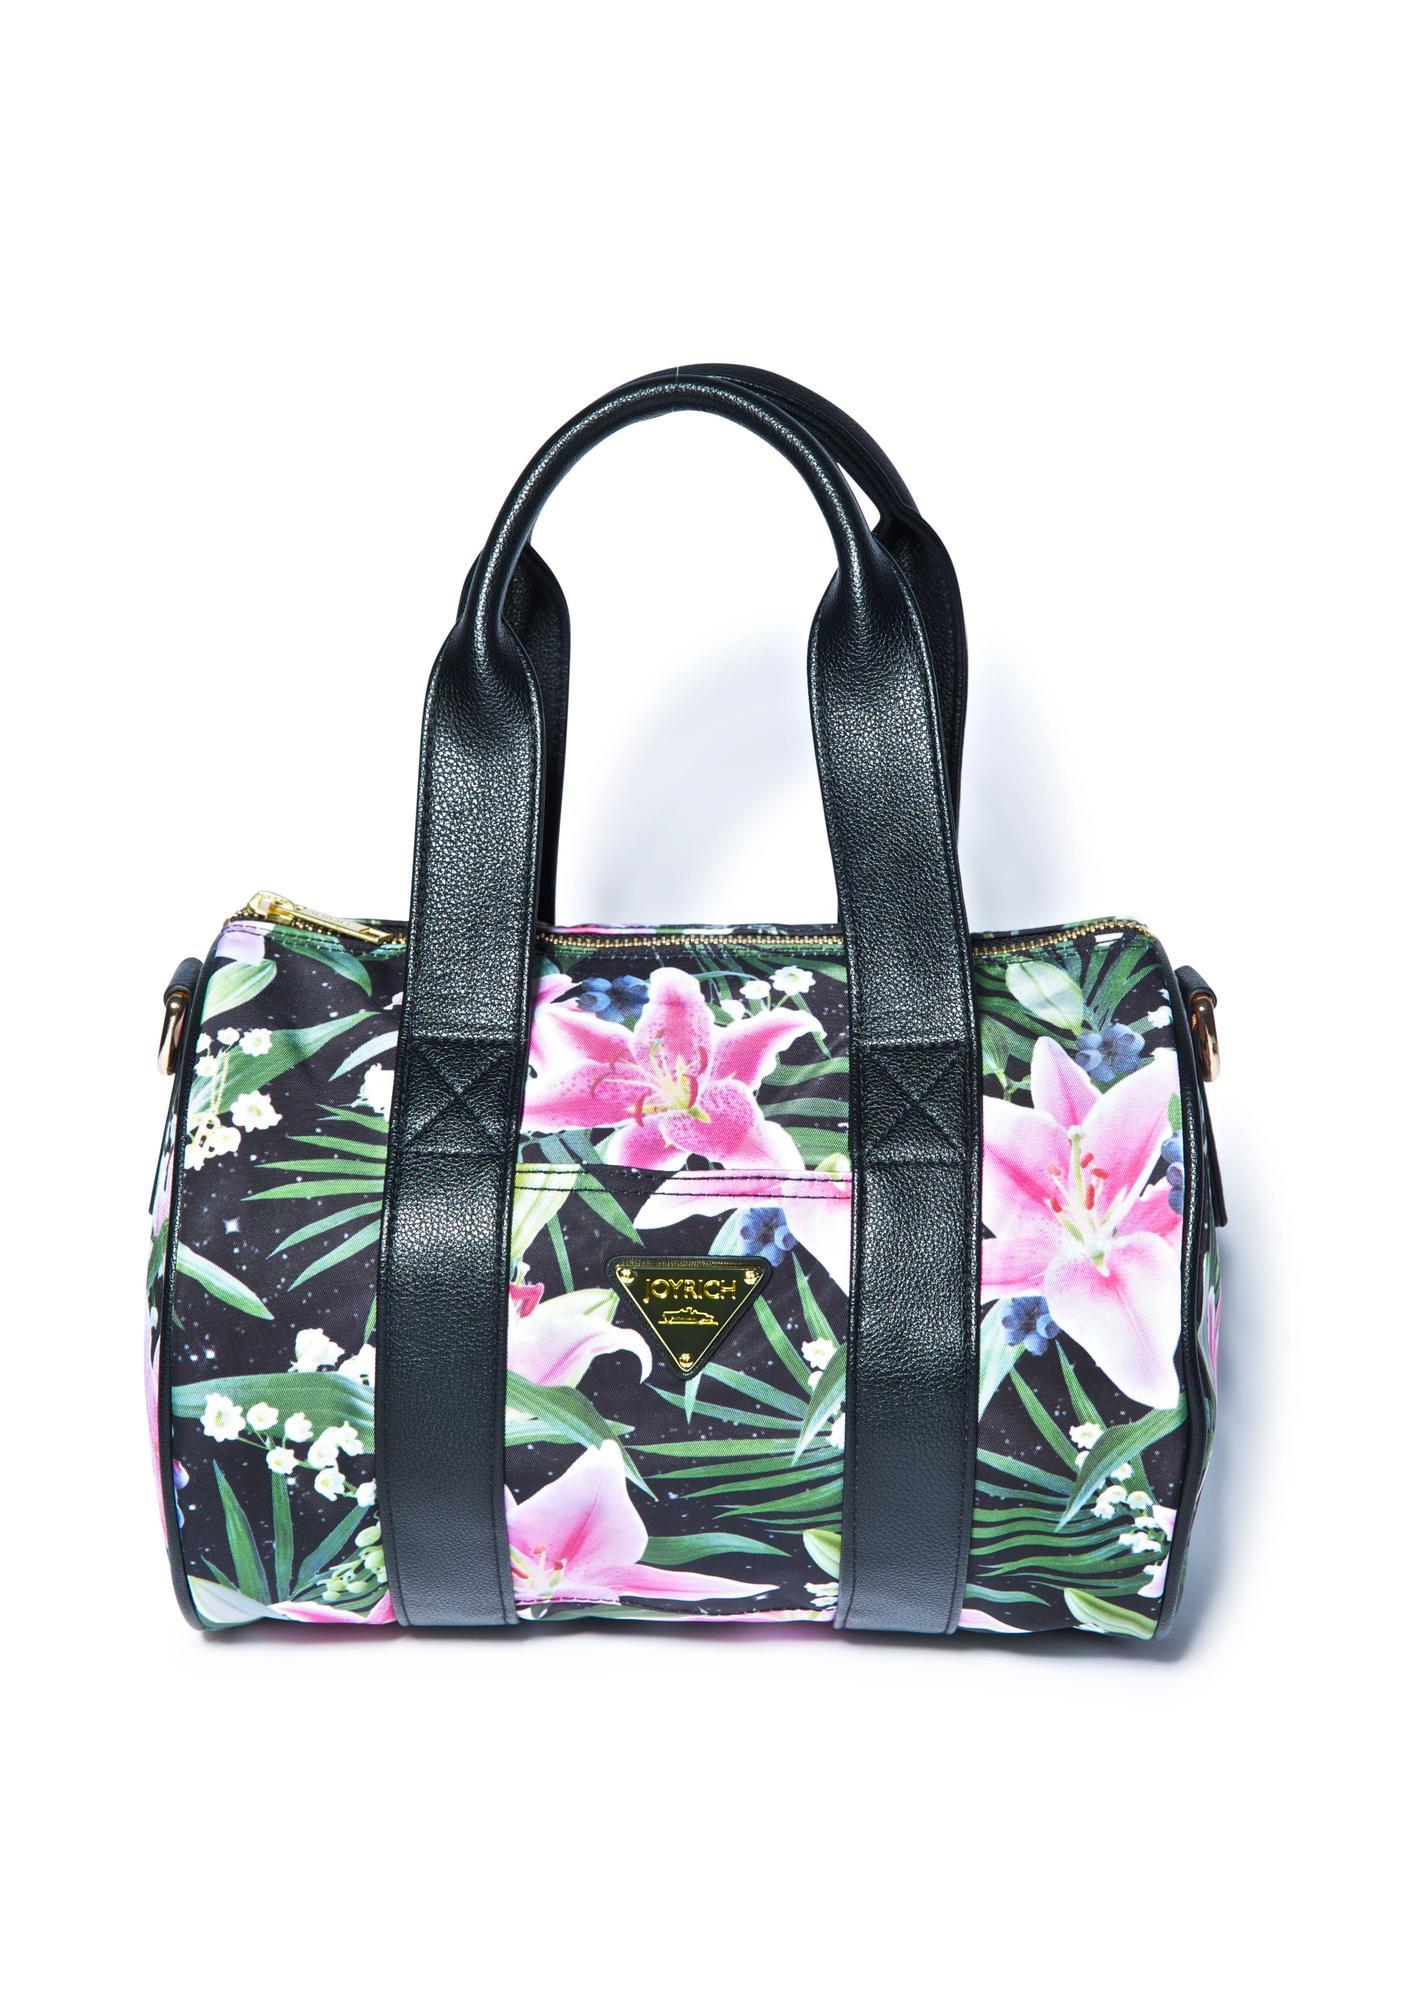 Joyrich Optical Garden Shoulder Boston Bag